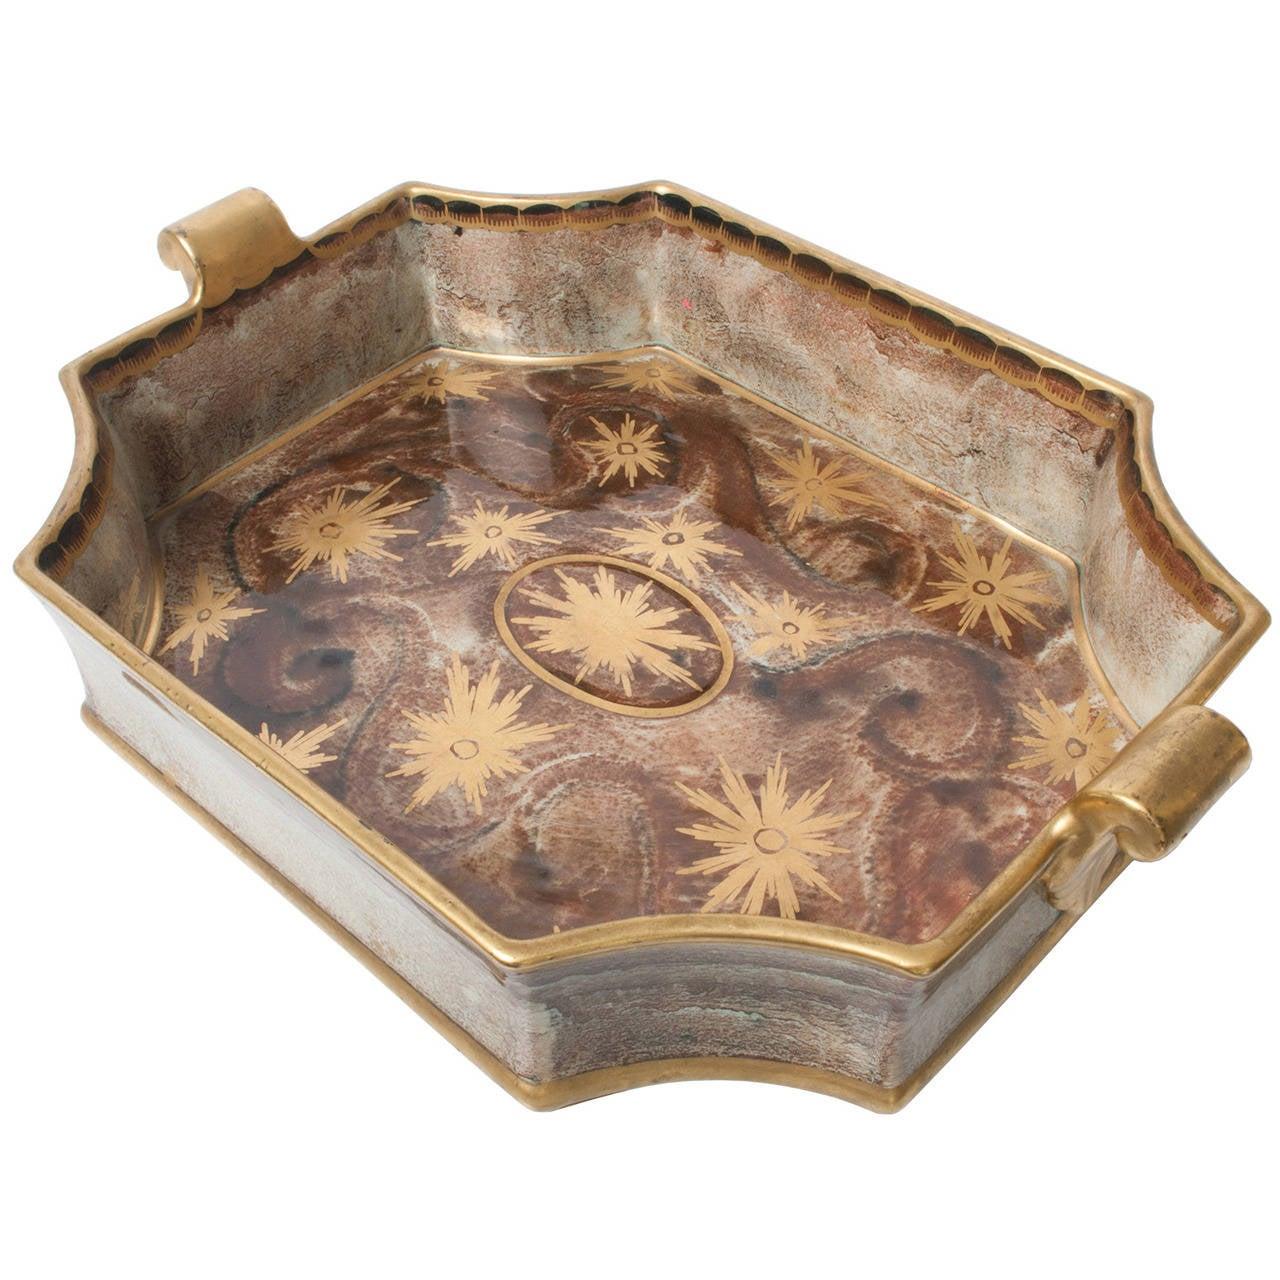 Swedish Art Deco Tray or Bowl by Josef Ekberg for Gustavsberg